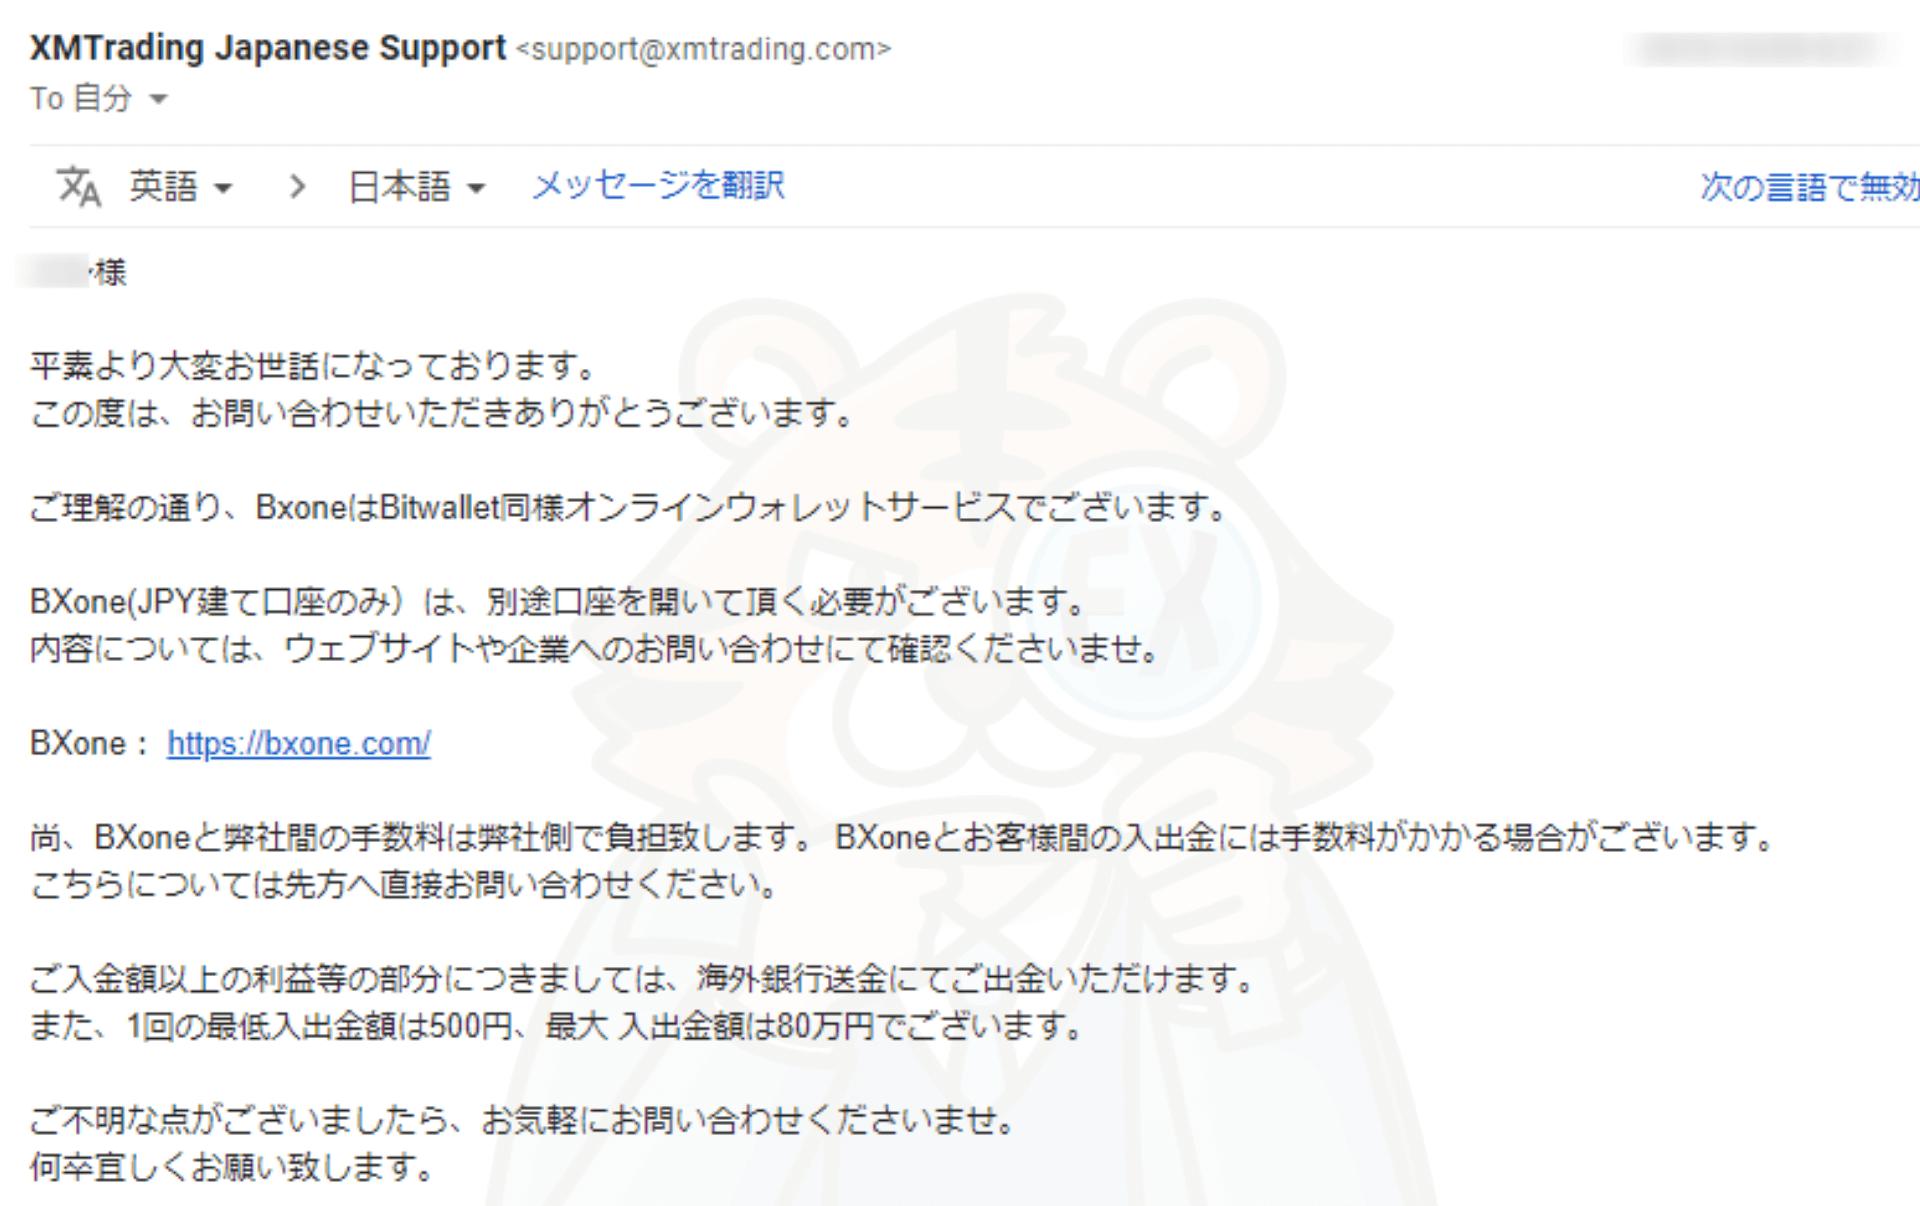 XMサポート返信内容